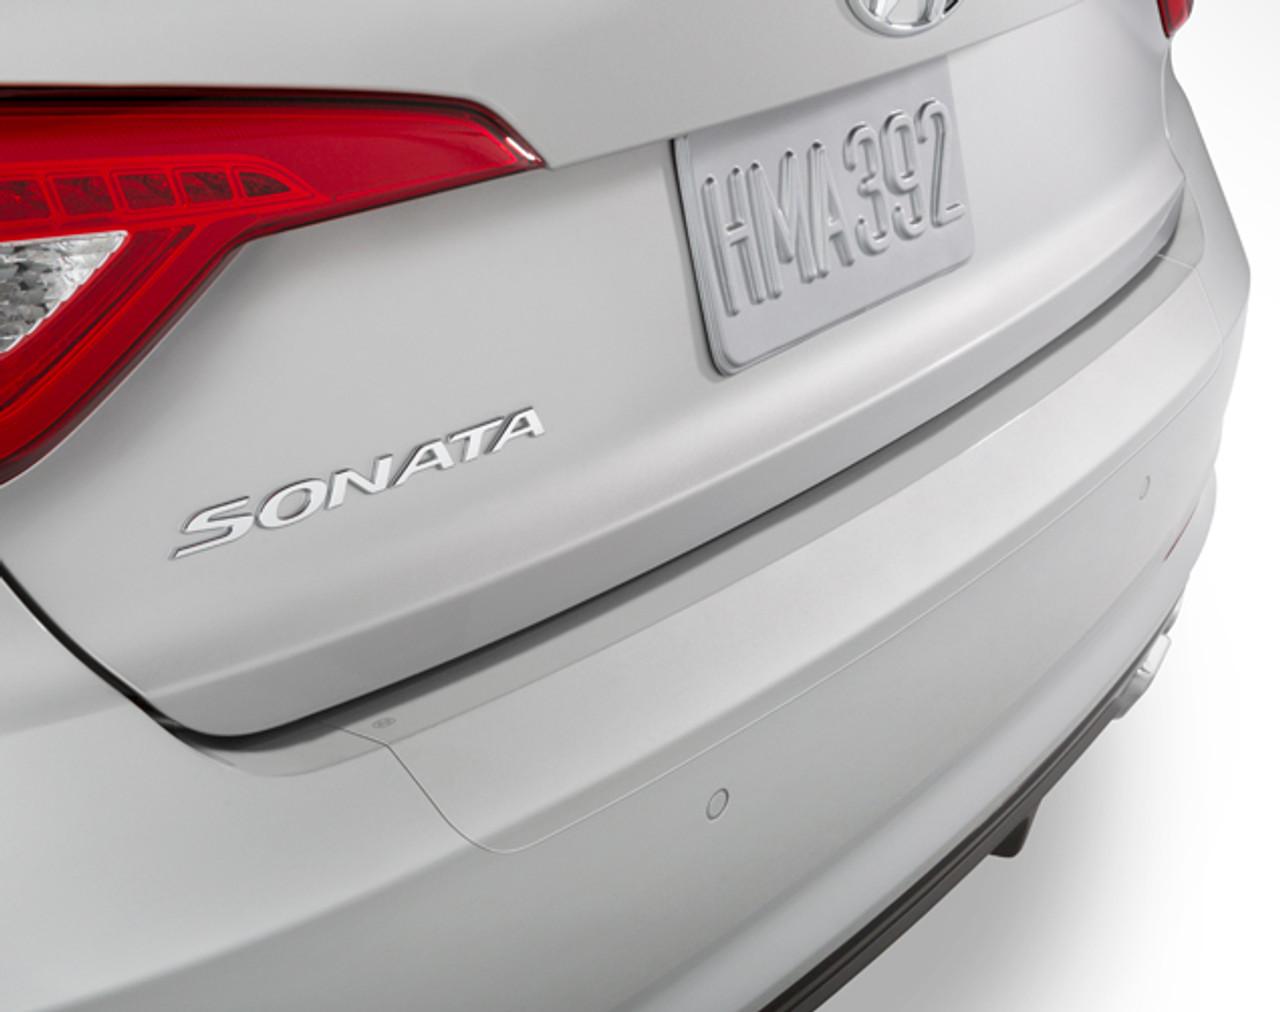 2018 2019 Hyundai Sonata Rear Bumper Protector Film J107